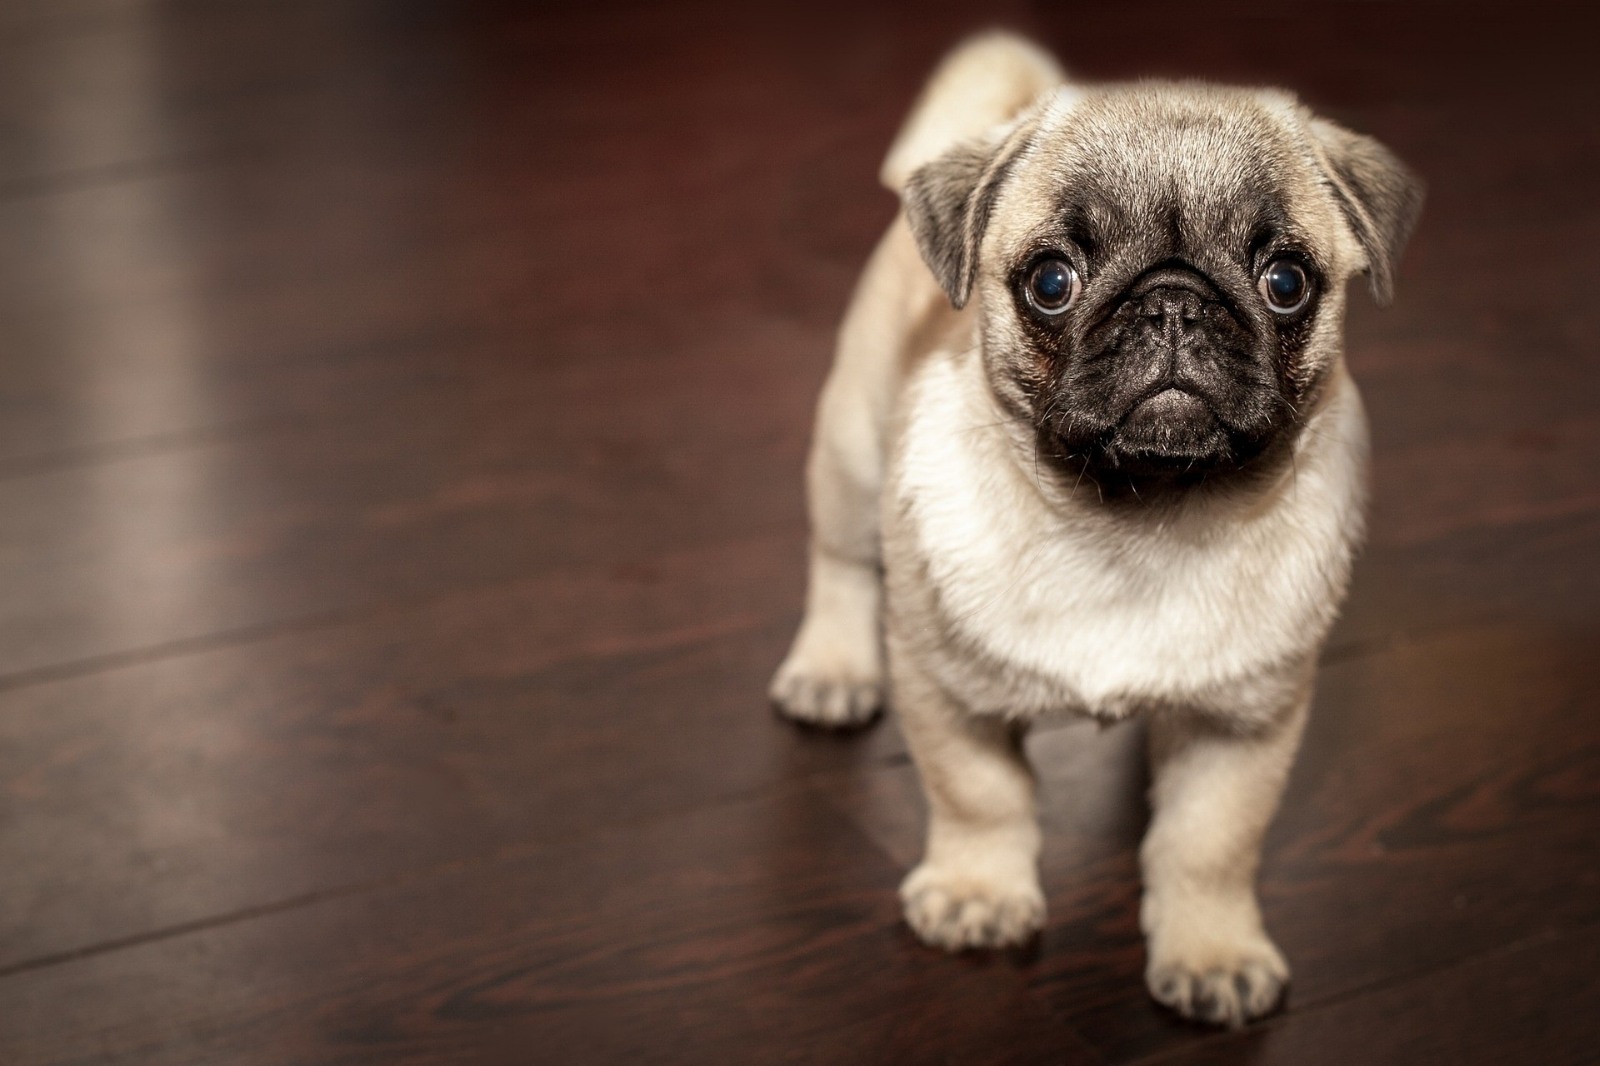 pug puppy.jpg